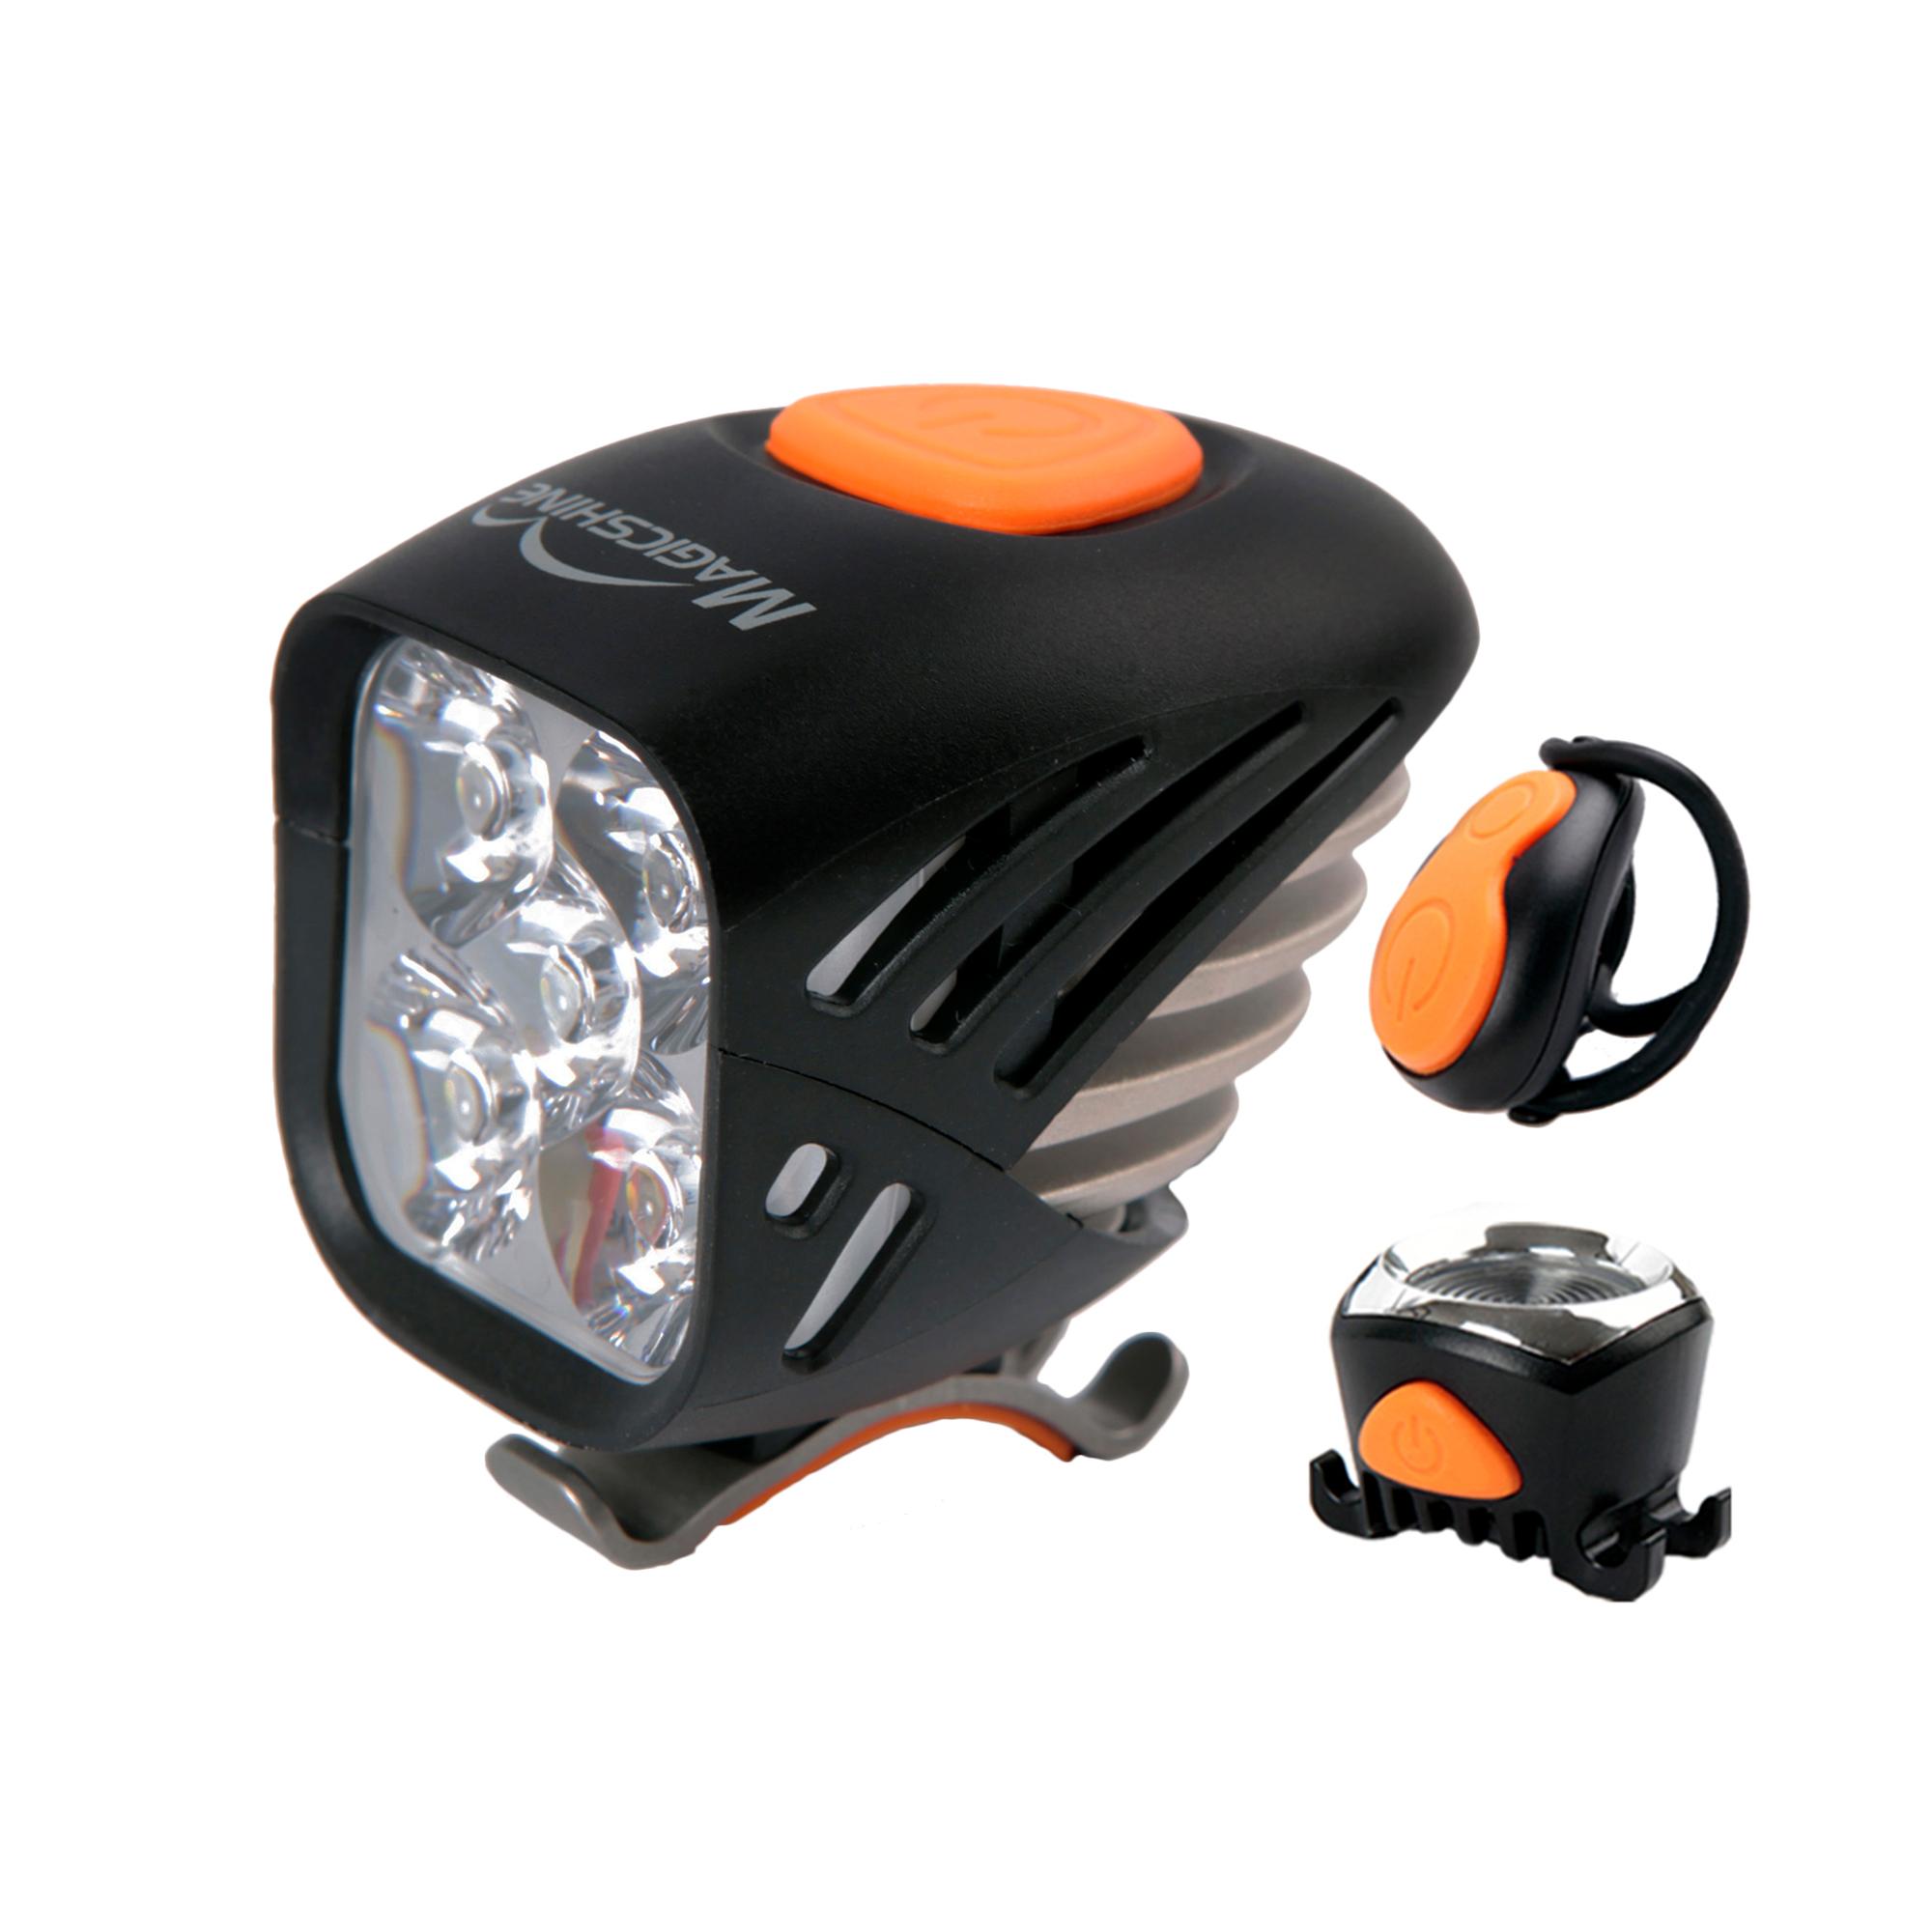 Quality Bike Lights | Magicshine MJ-906 Bike Light Combo for Night ...